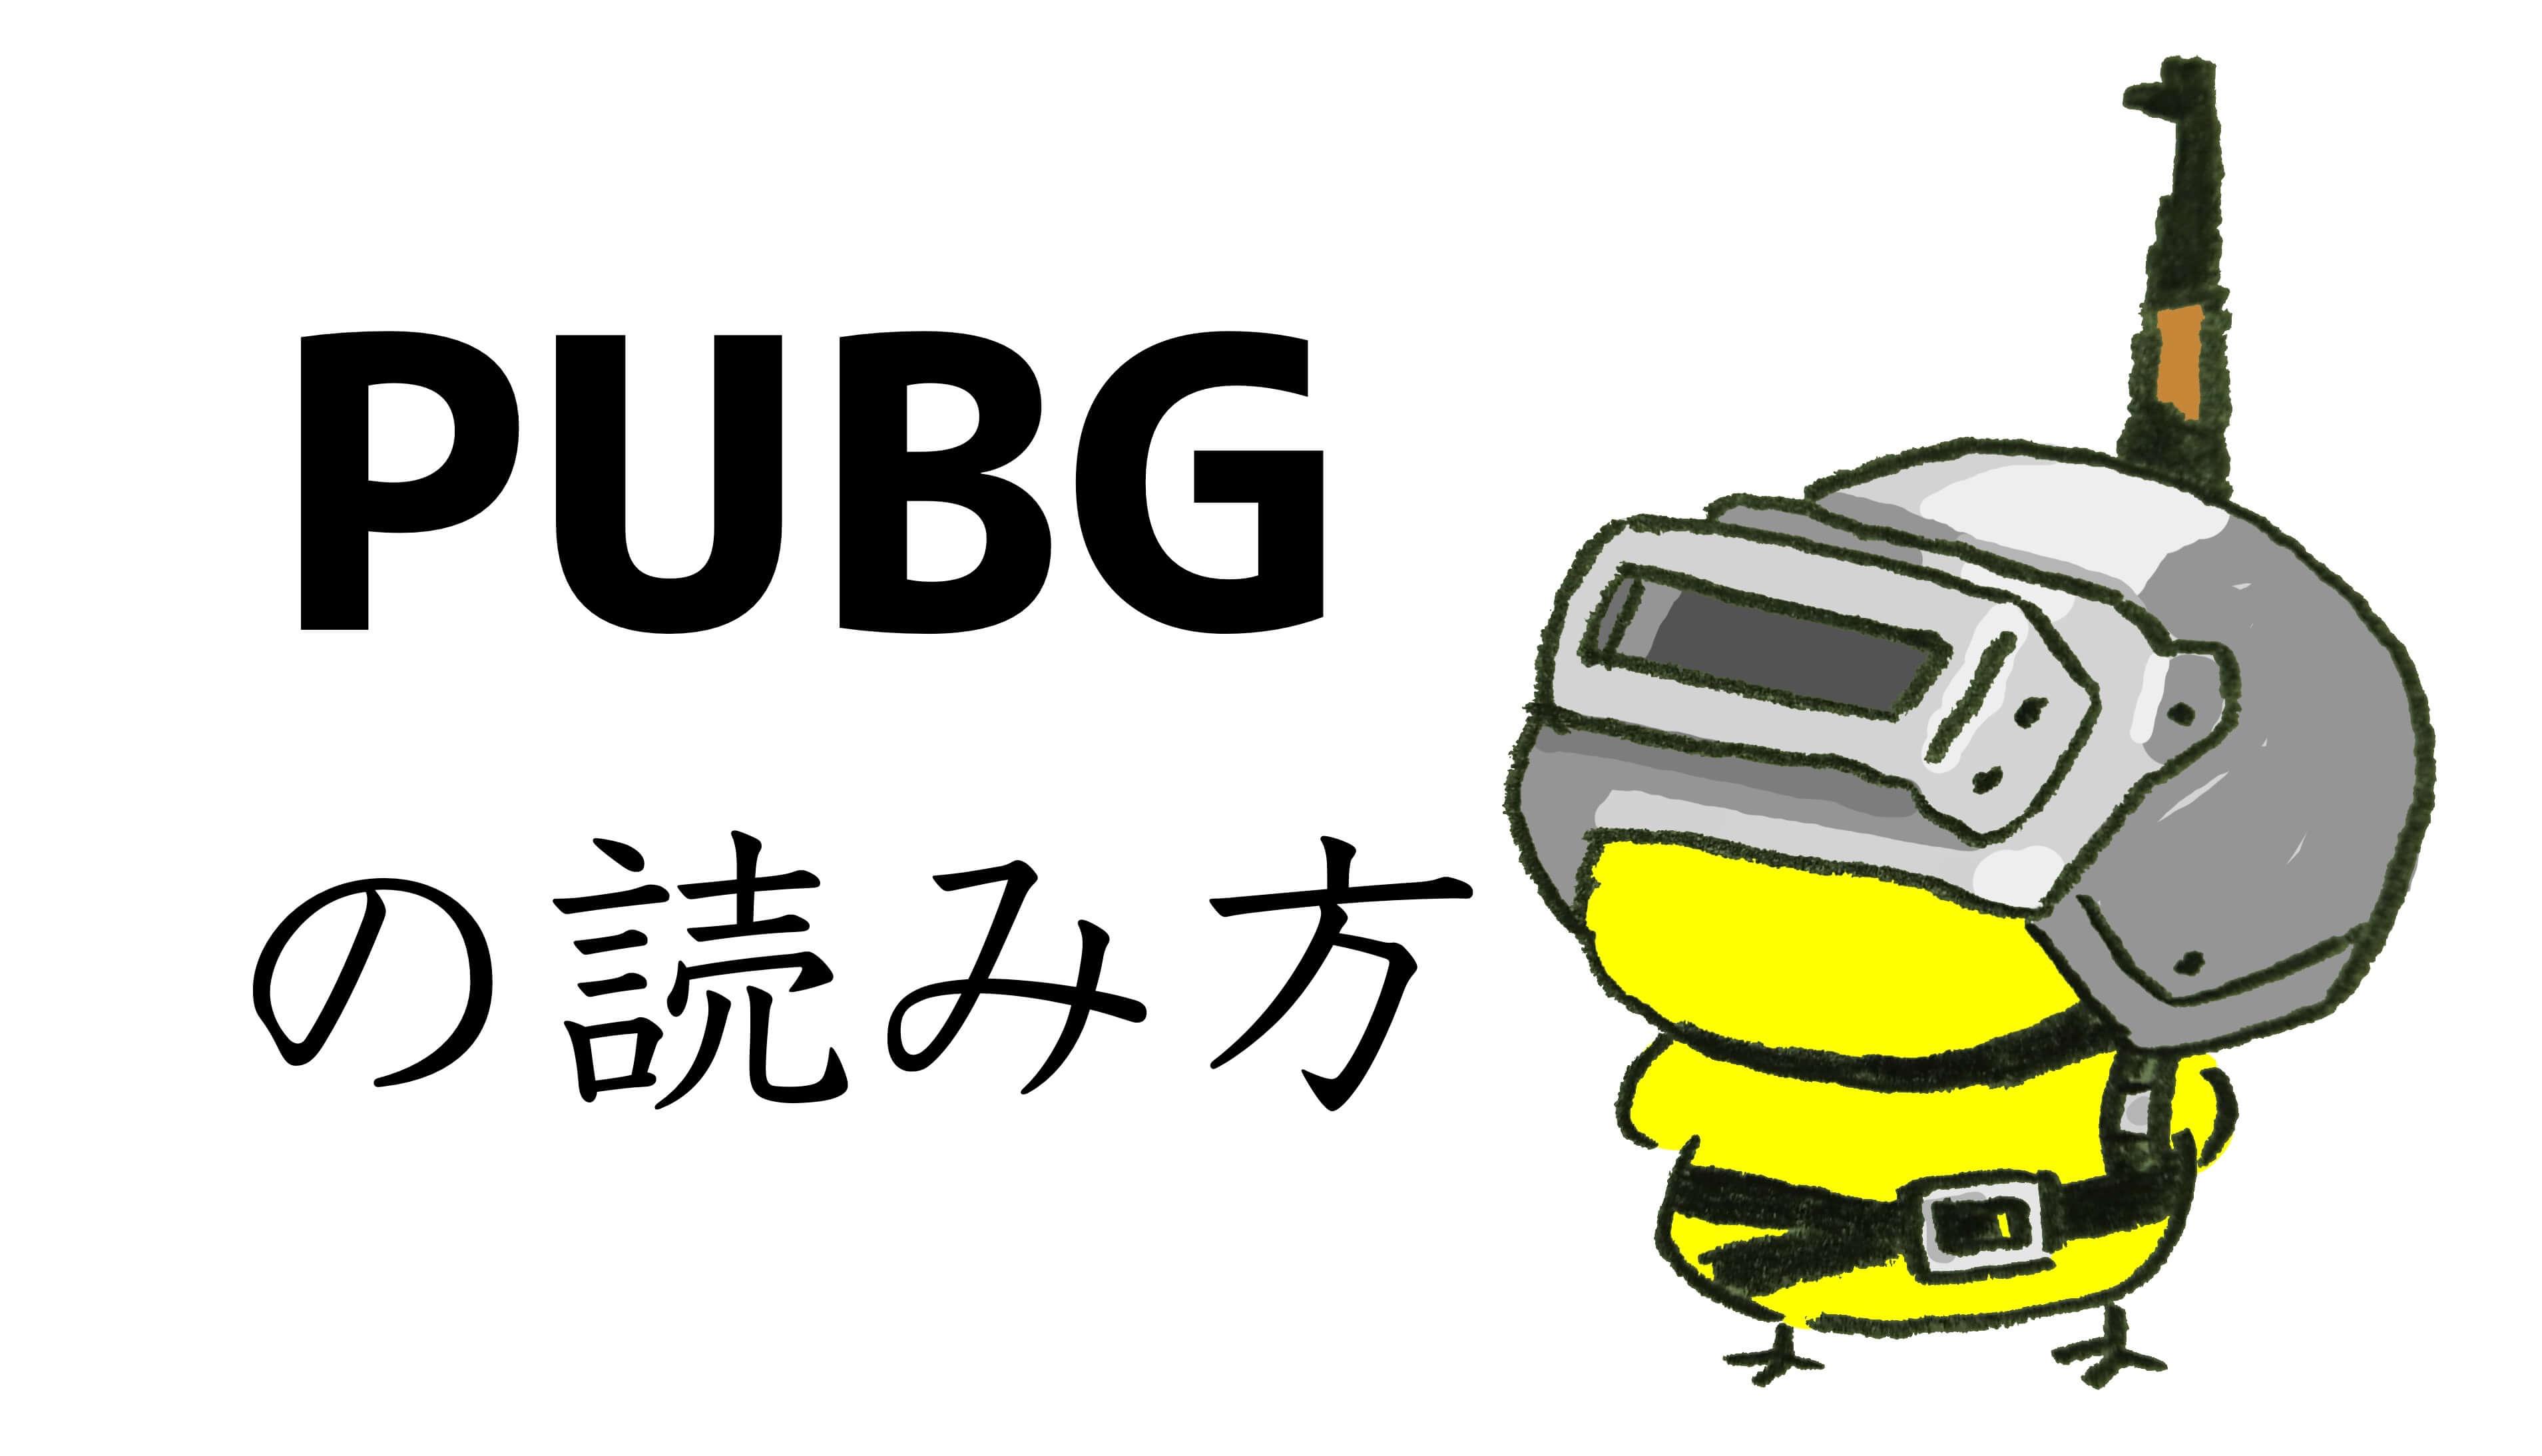 PUBGの読み方